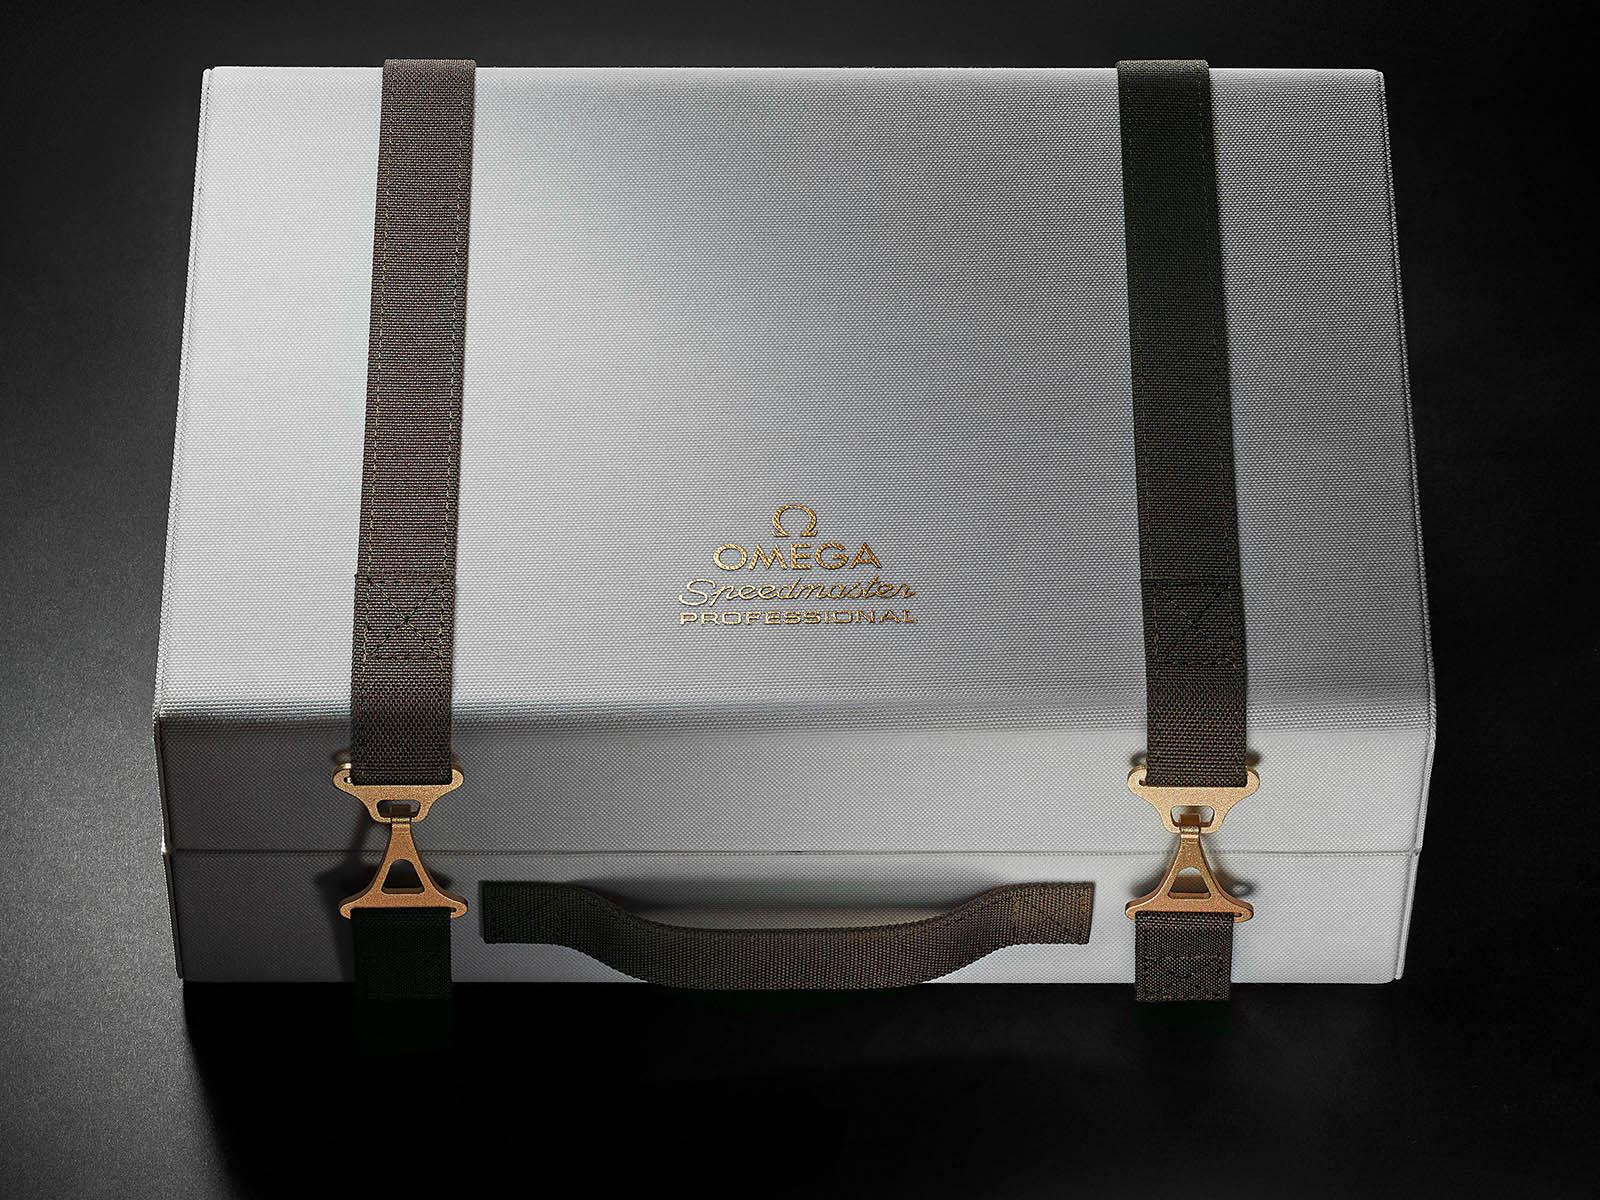 310-20-42-50-01-001-omega-speedmaster-apollo-11-50th-anniversary-limited-edition-6.jpg